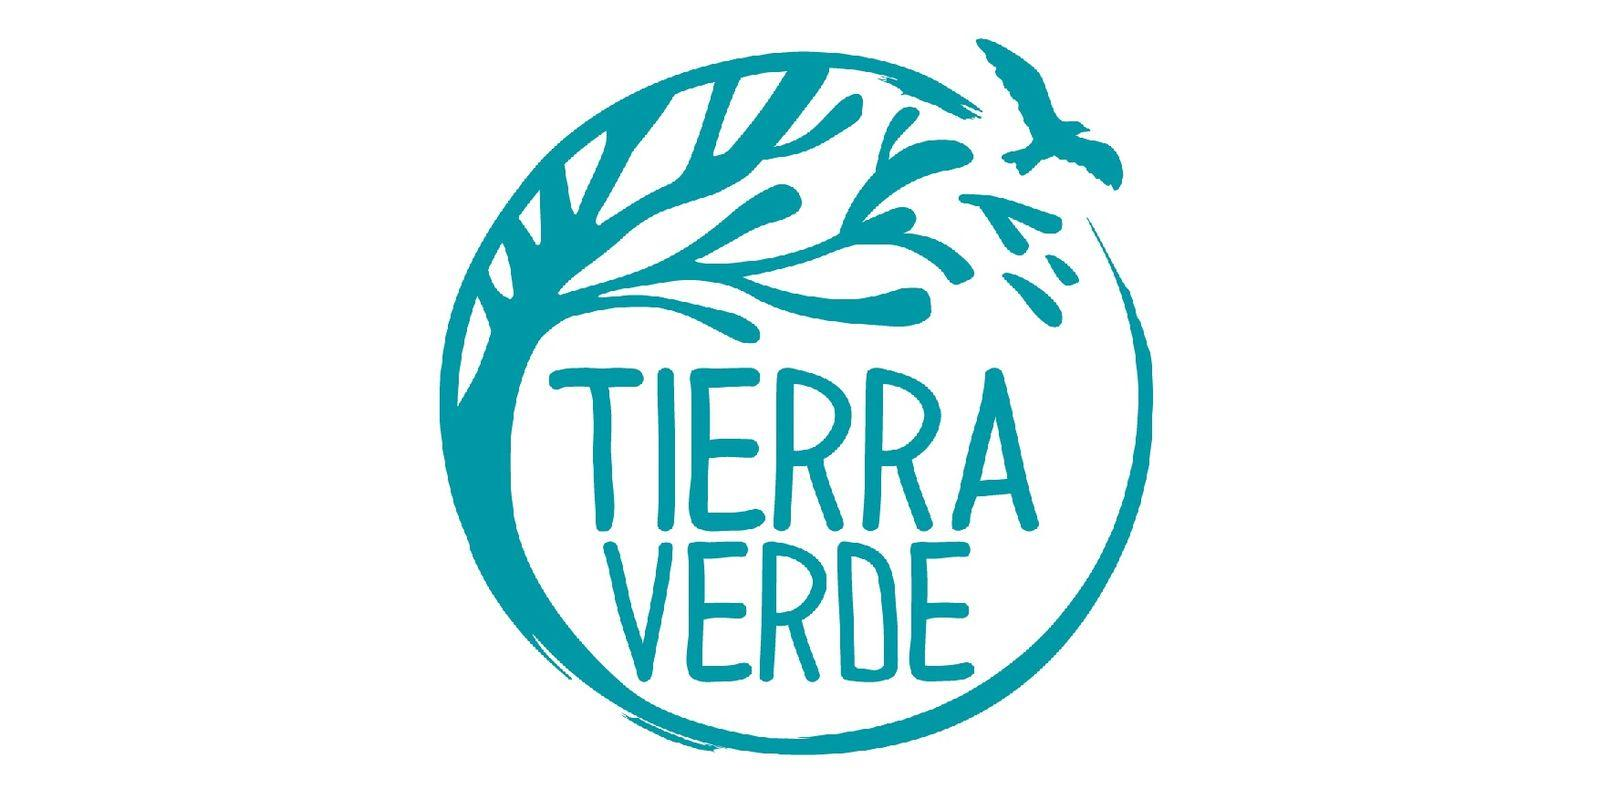 TIERRA VERDE: Cesta za čistou planetou